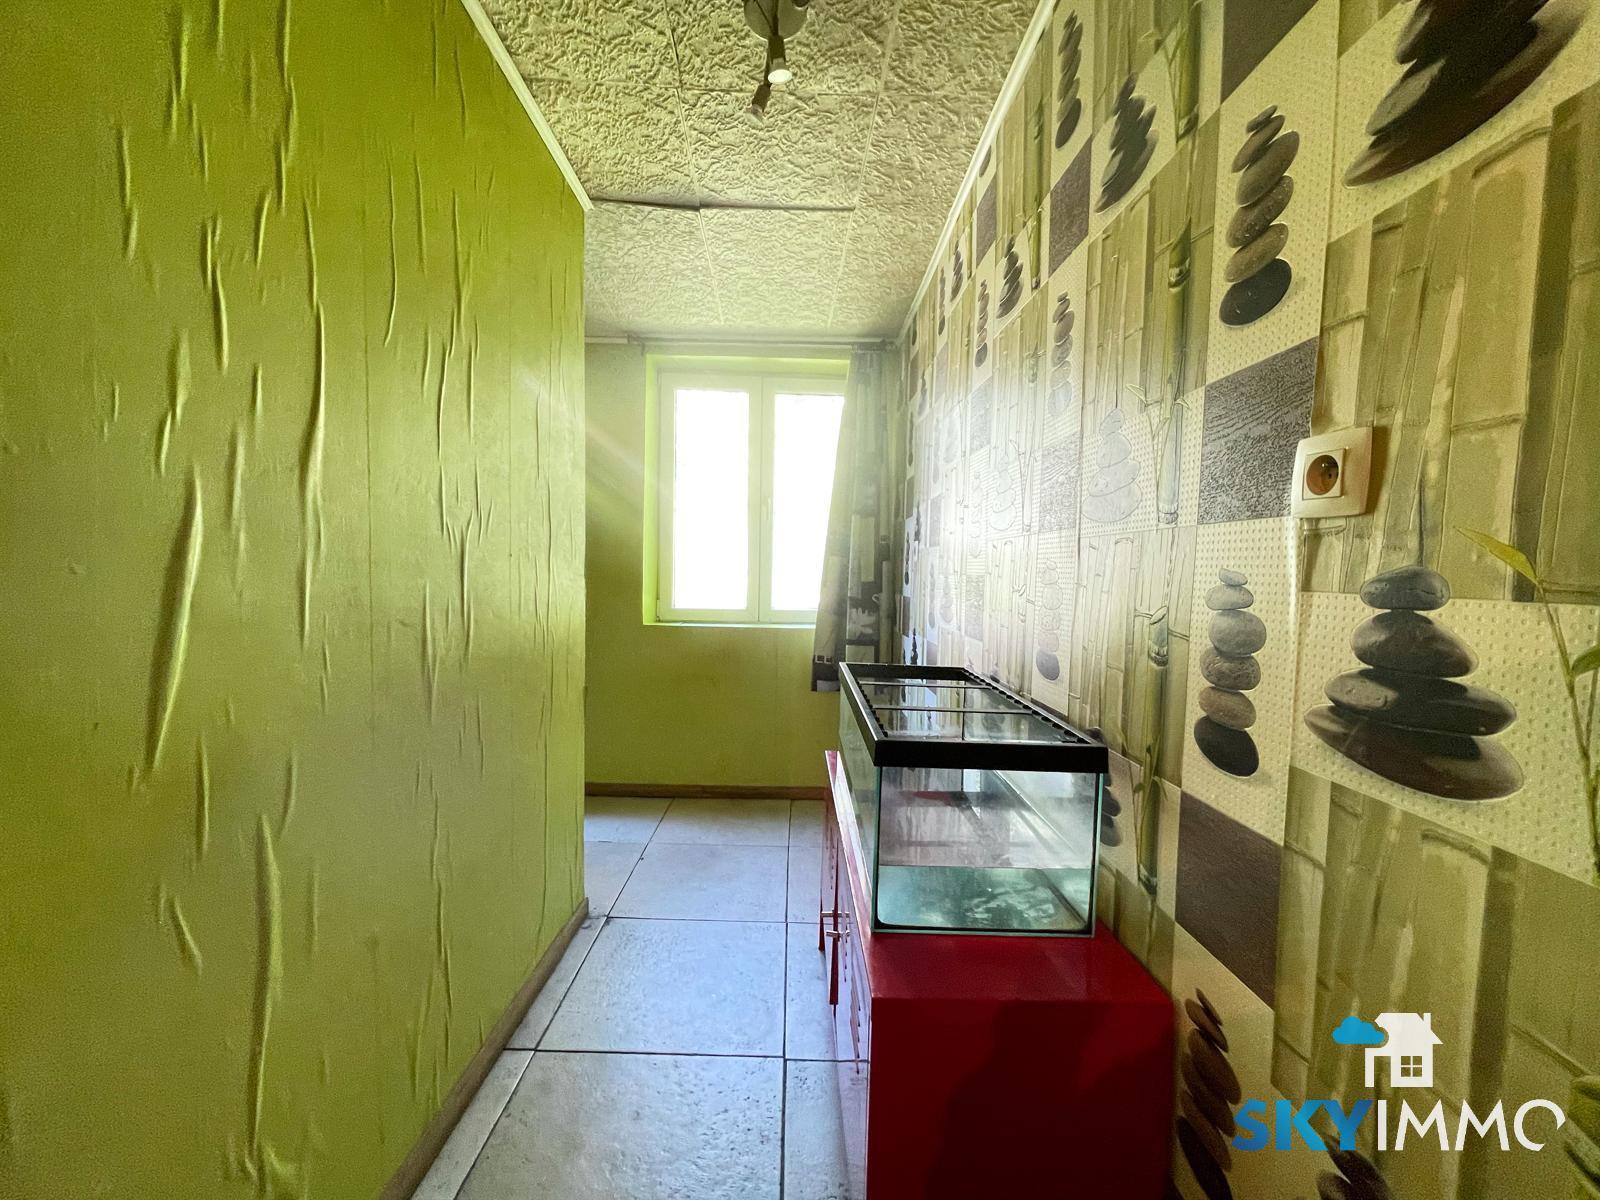 Maison - Seraing Jemeppesur-Meuse - #4517380-11